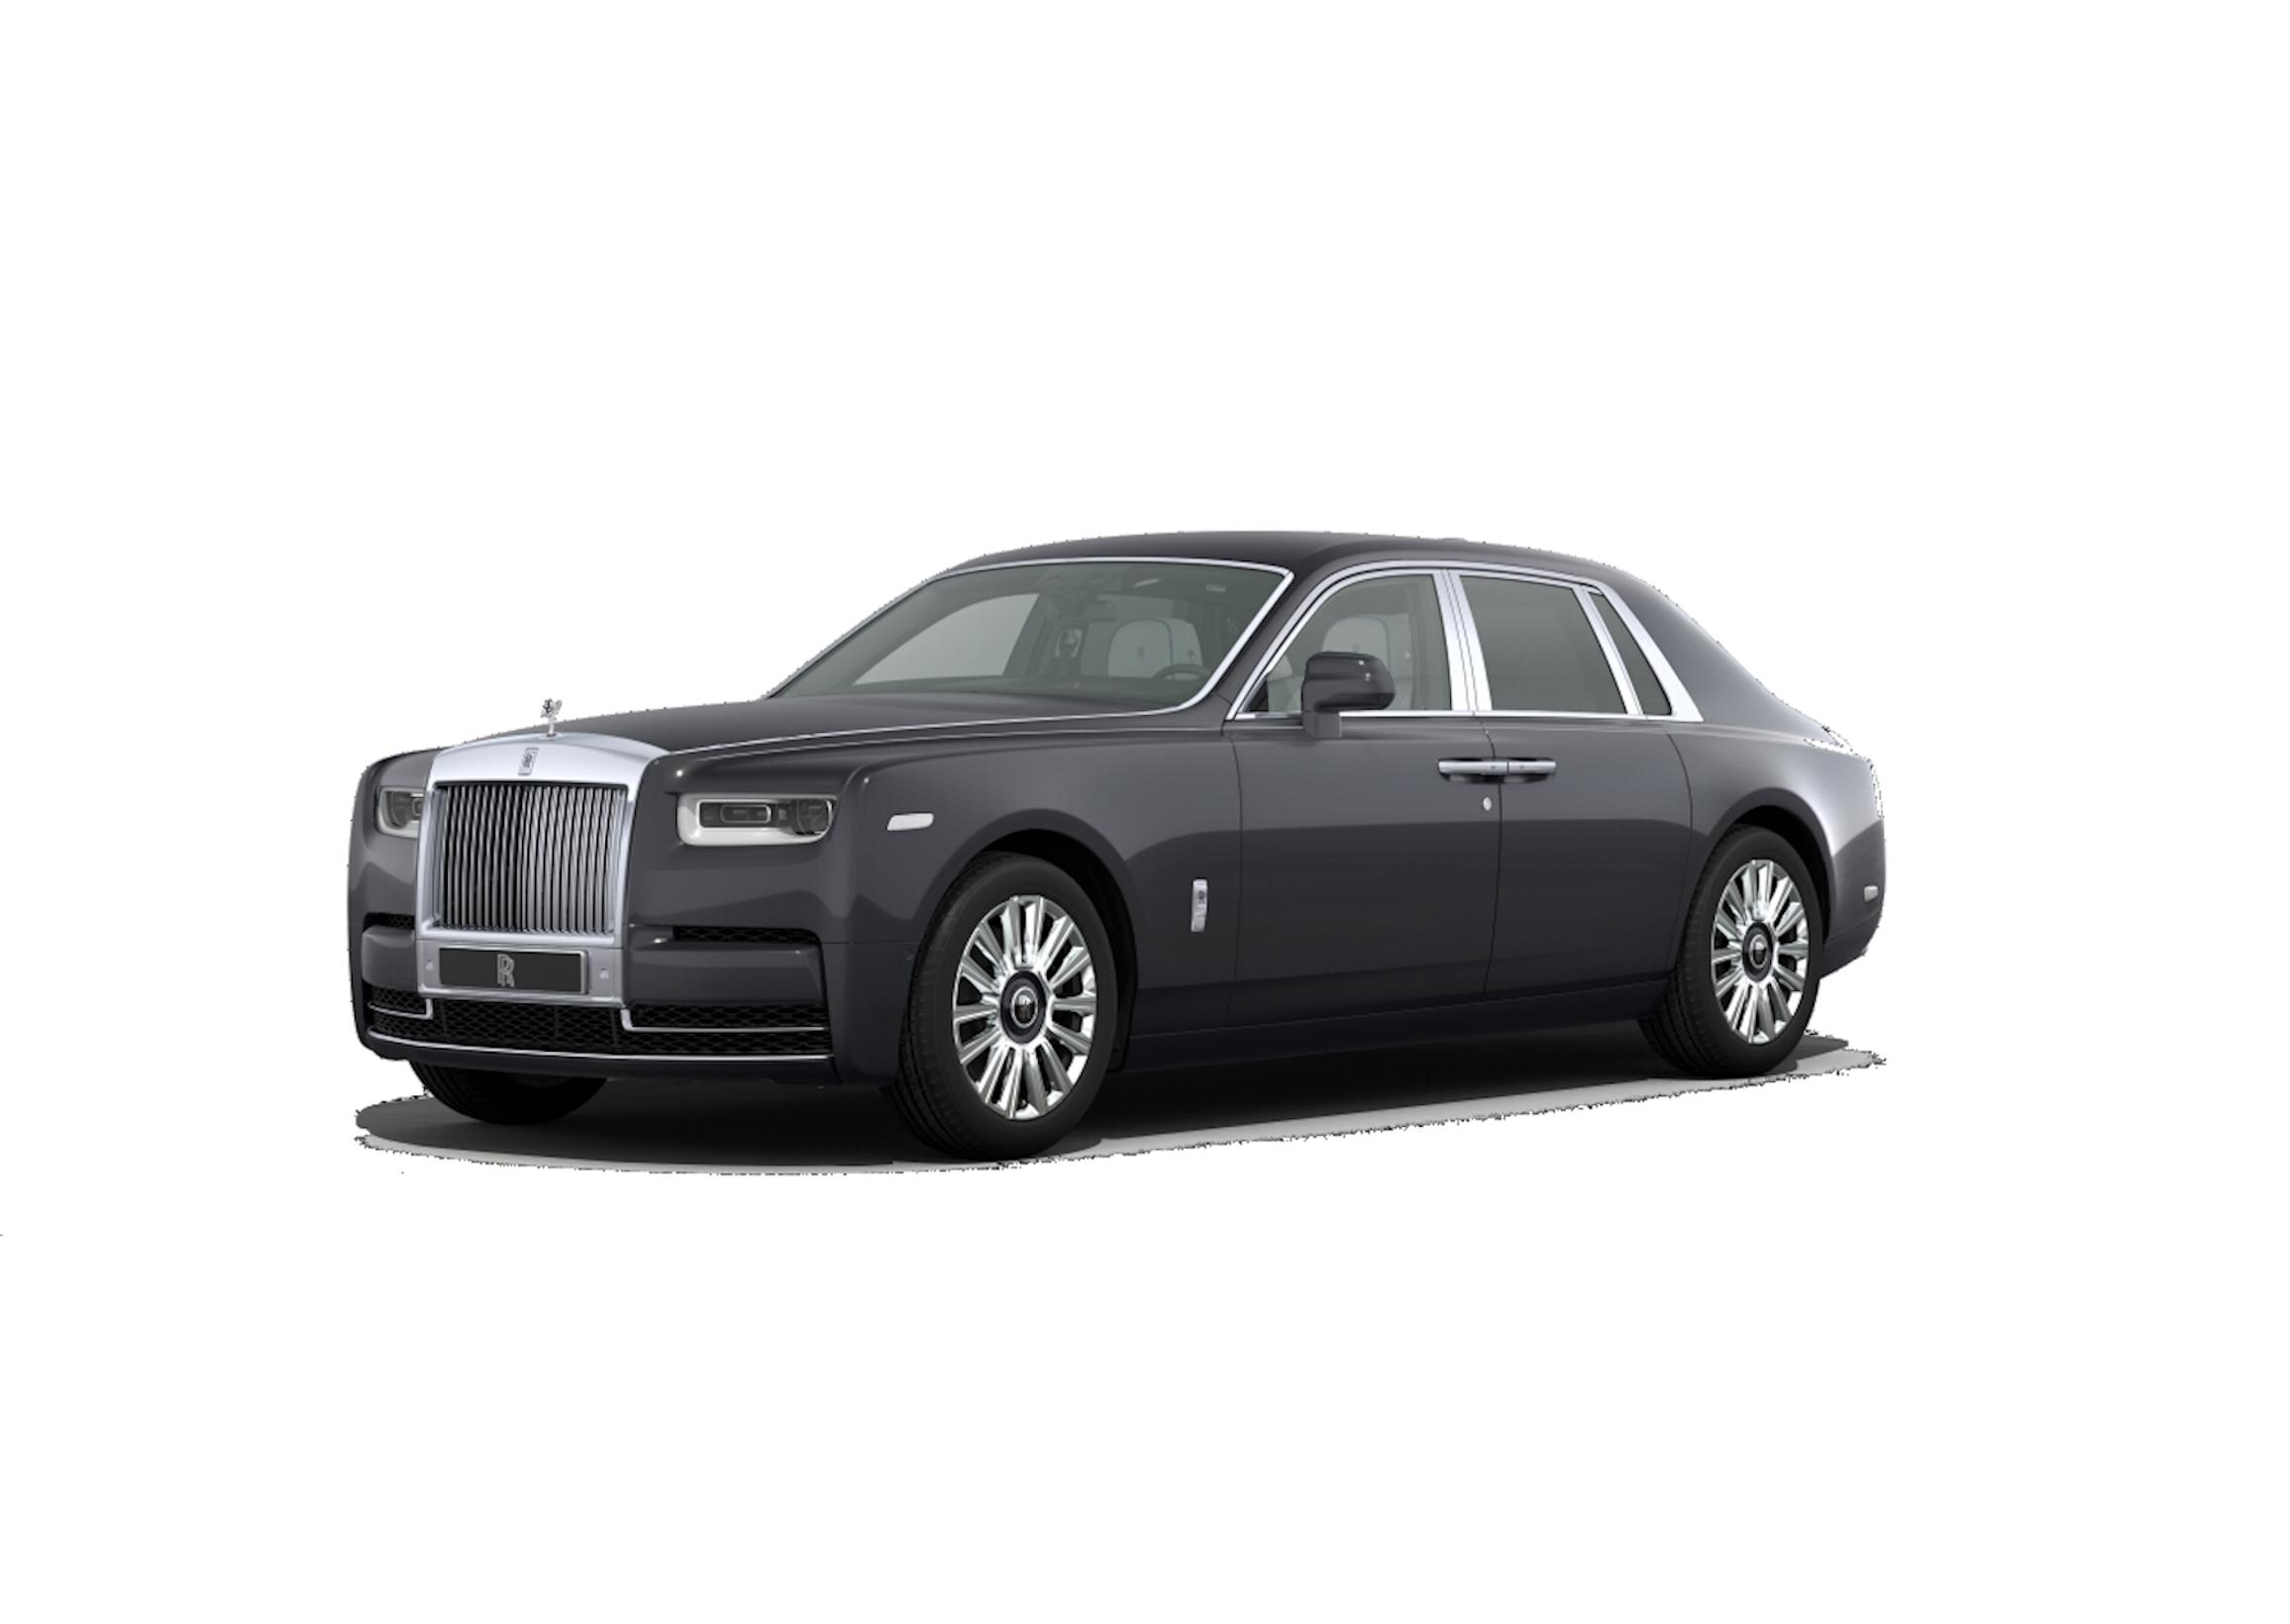 Rolls Royce Phantom Price In Saudi Arabia New Rolls Royce Phantom Photos And Specs Yallamotor